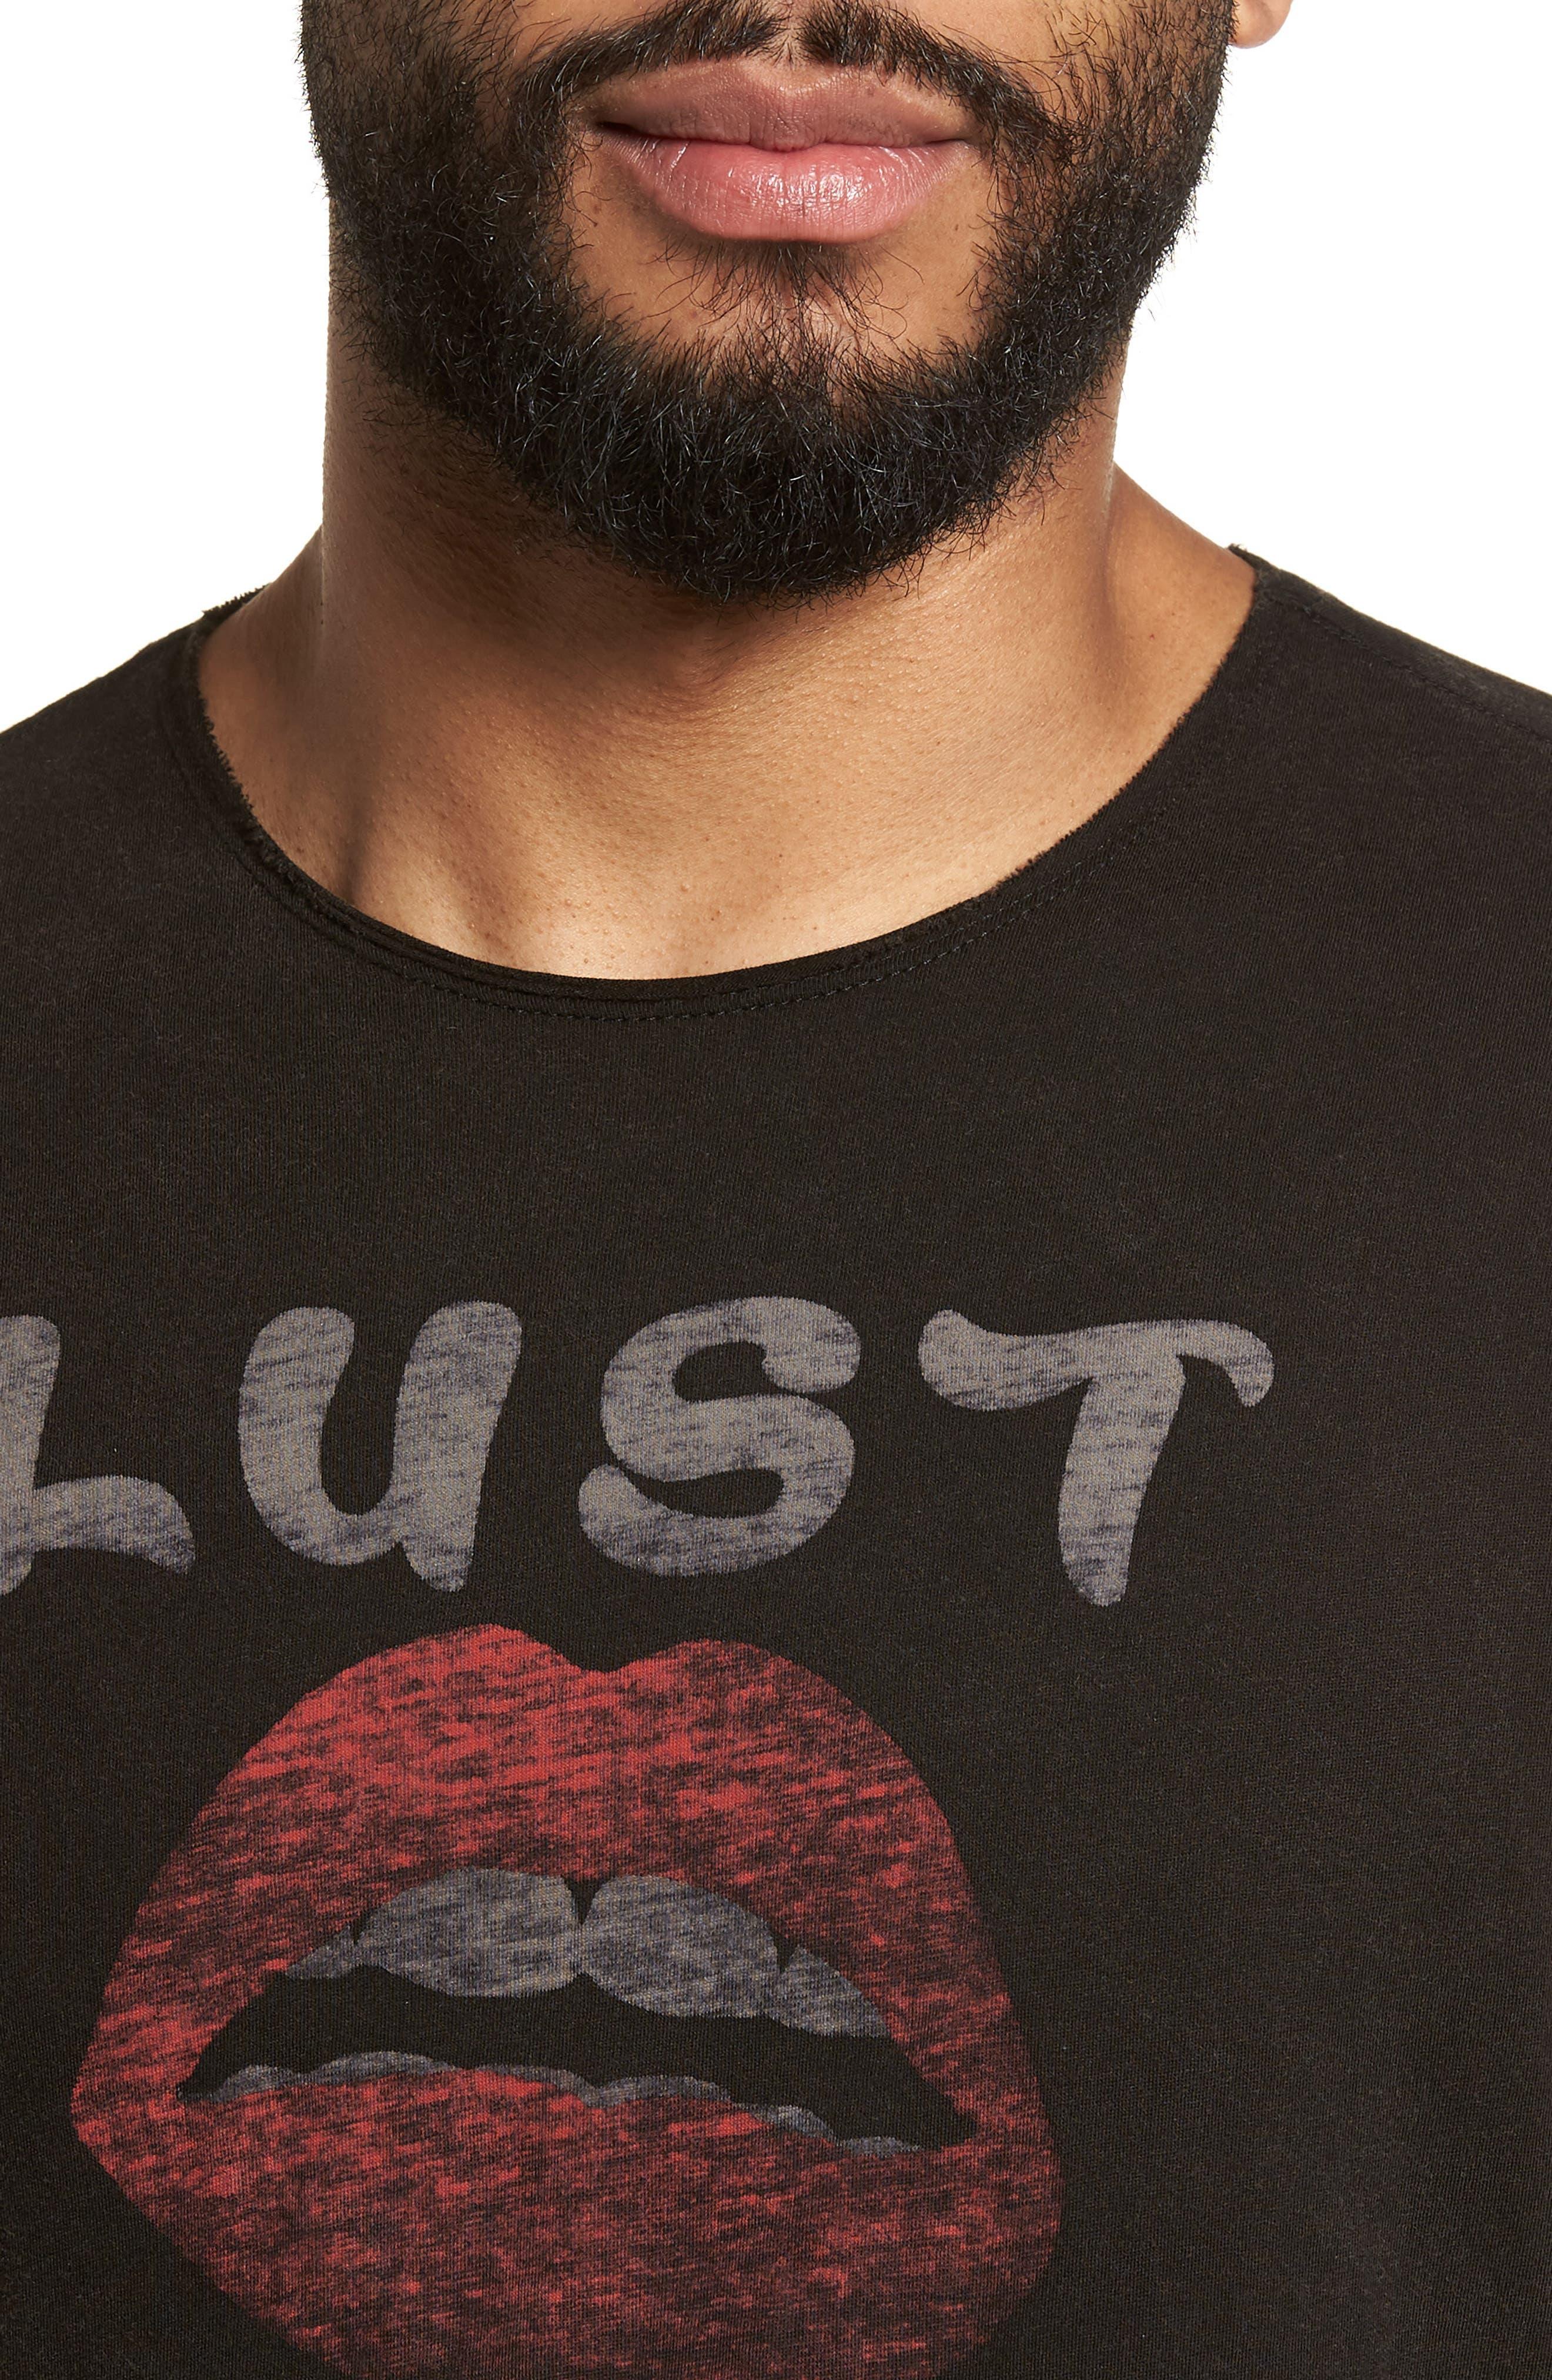 Lust or Bust T-Shirt,                             Alternate thumbnail 4, color,                             001